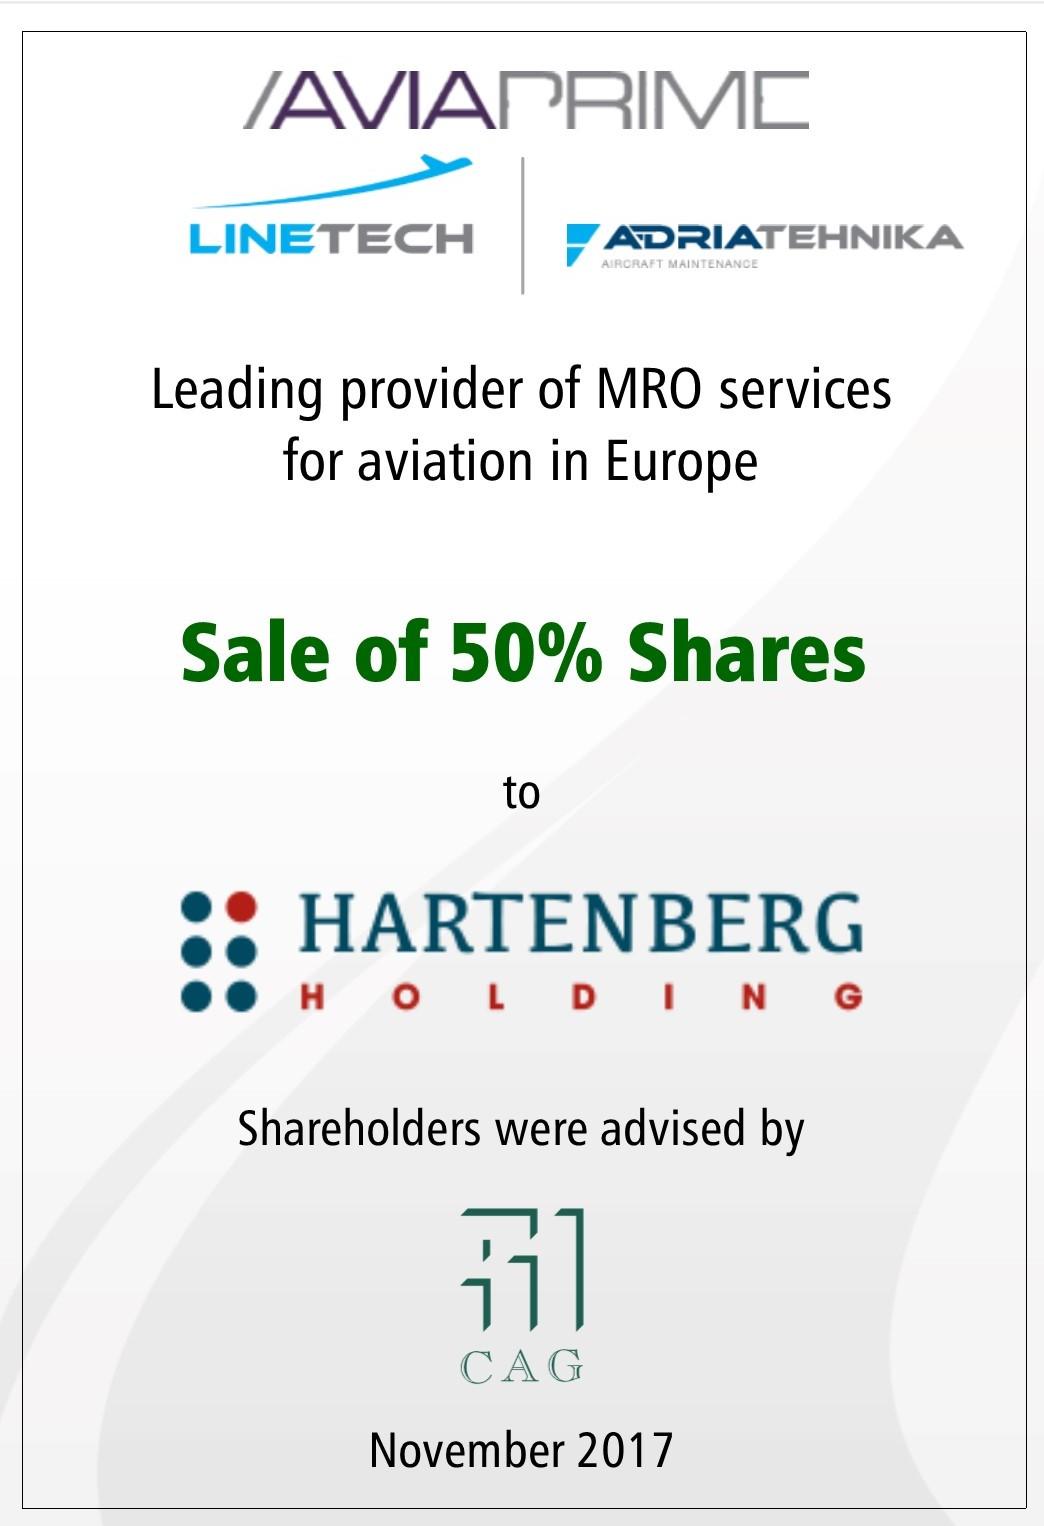 Hartenberg Holding